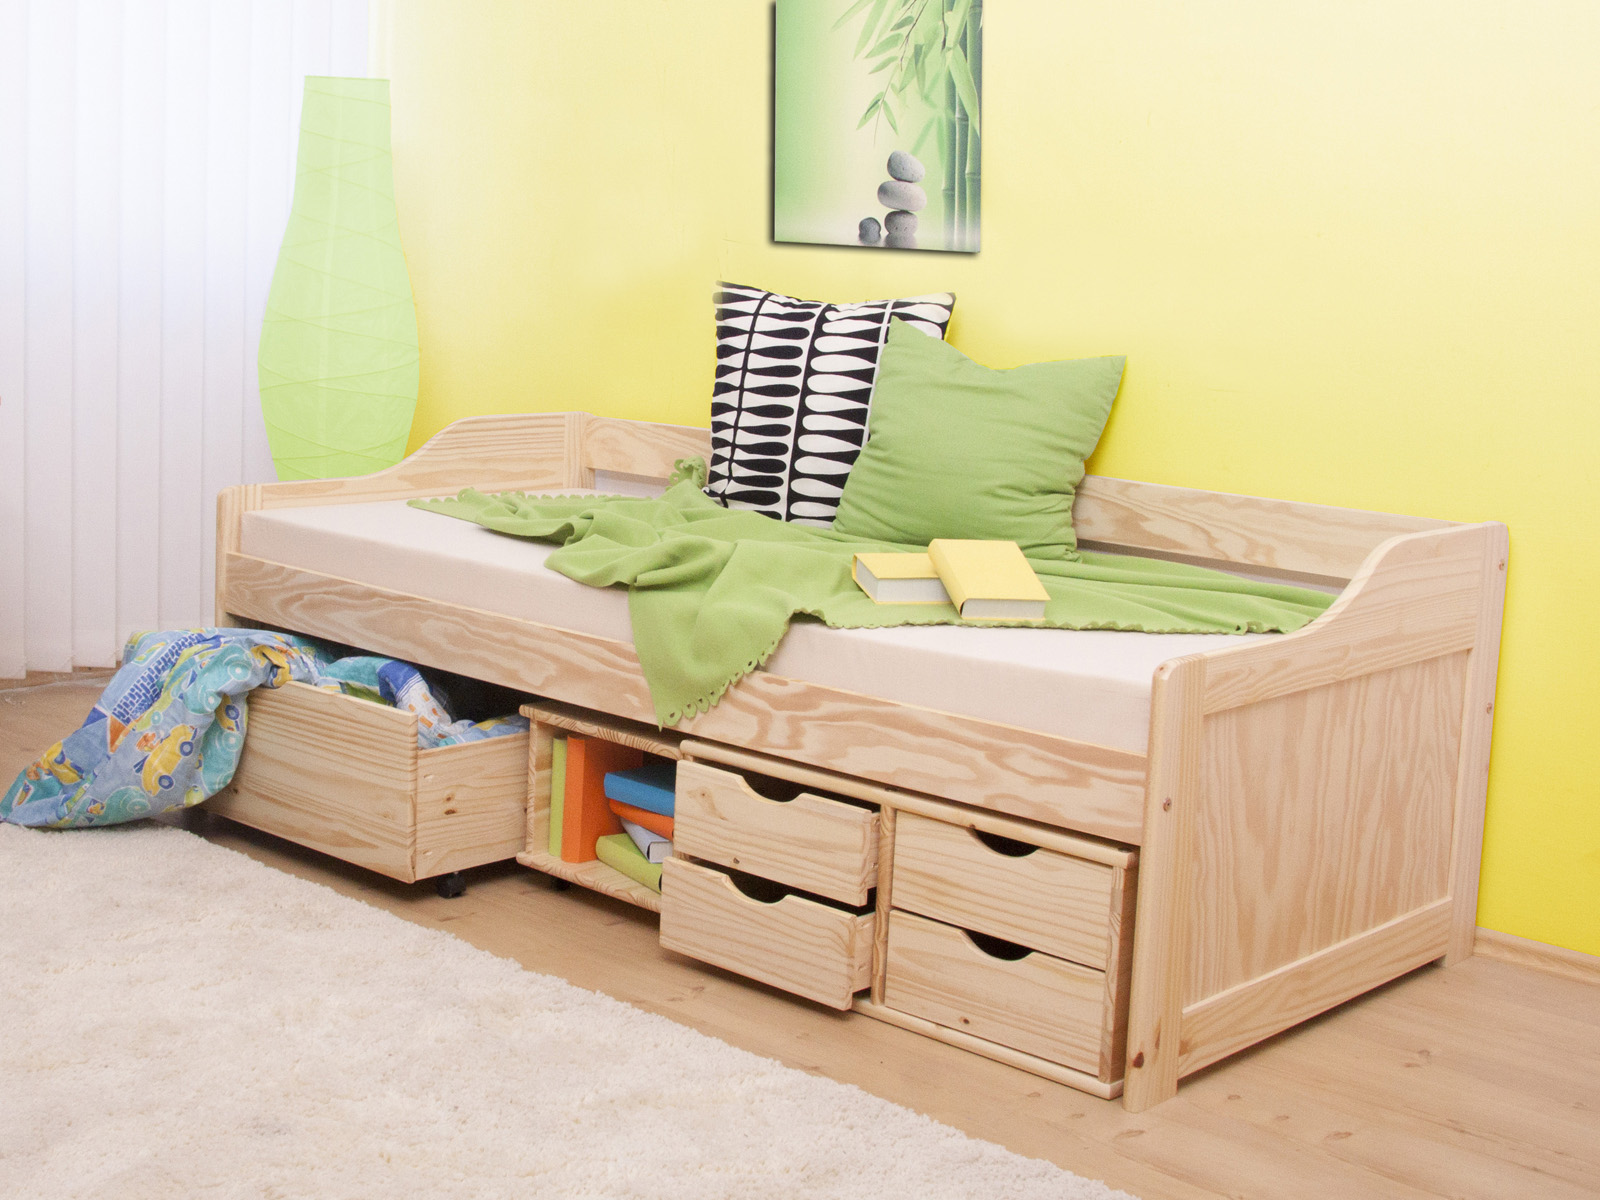 Jednolůžková postel 90 cm - Tempo Kondela - Maxi (masiv, s roštem)